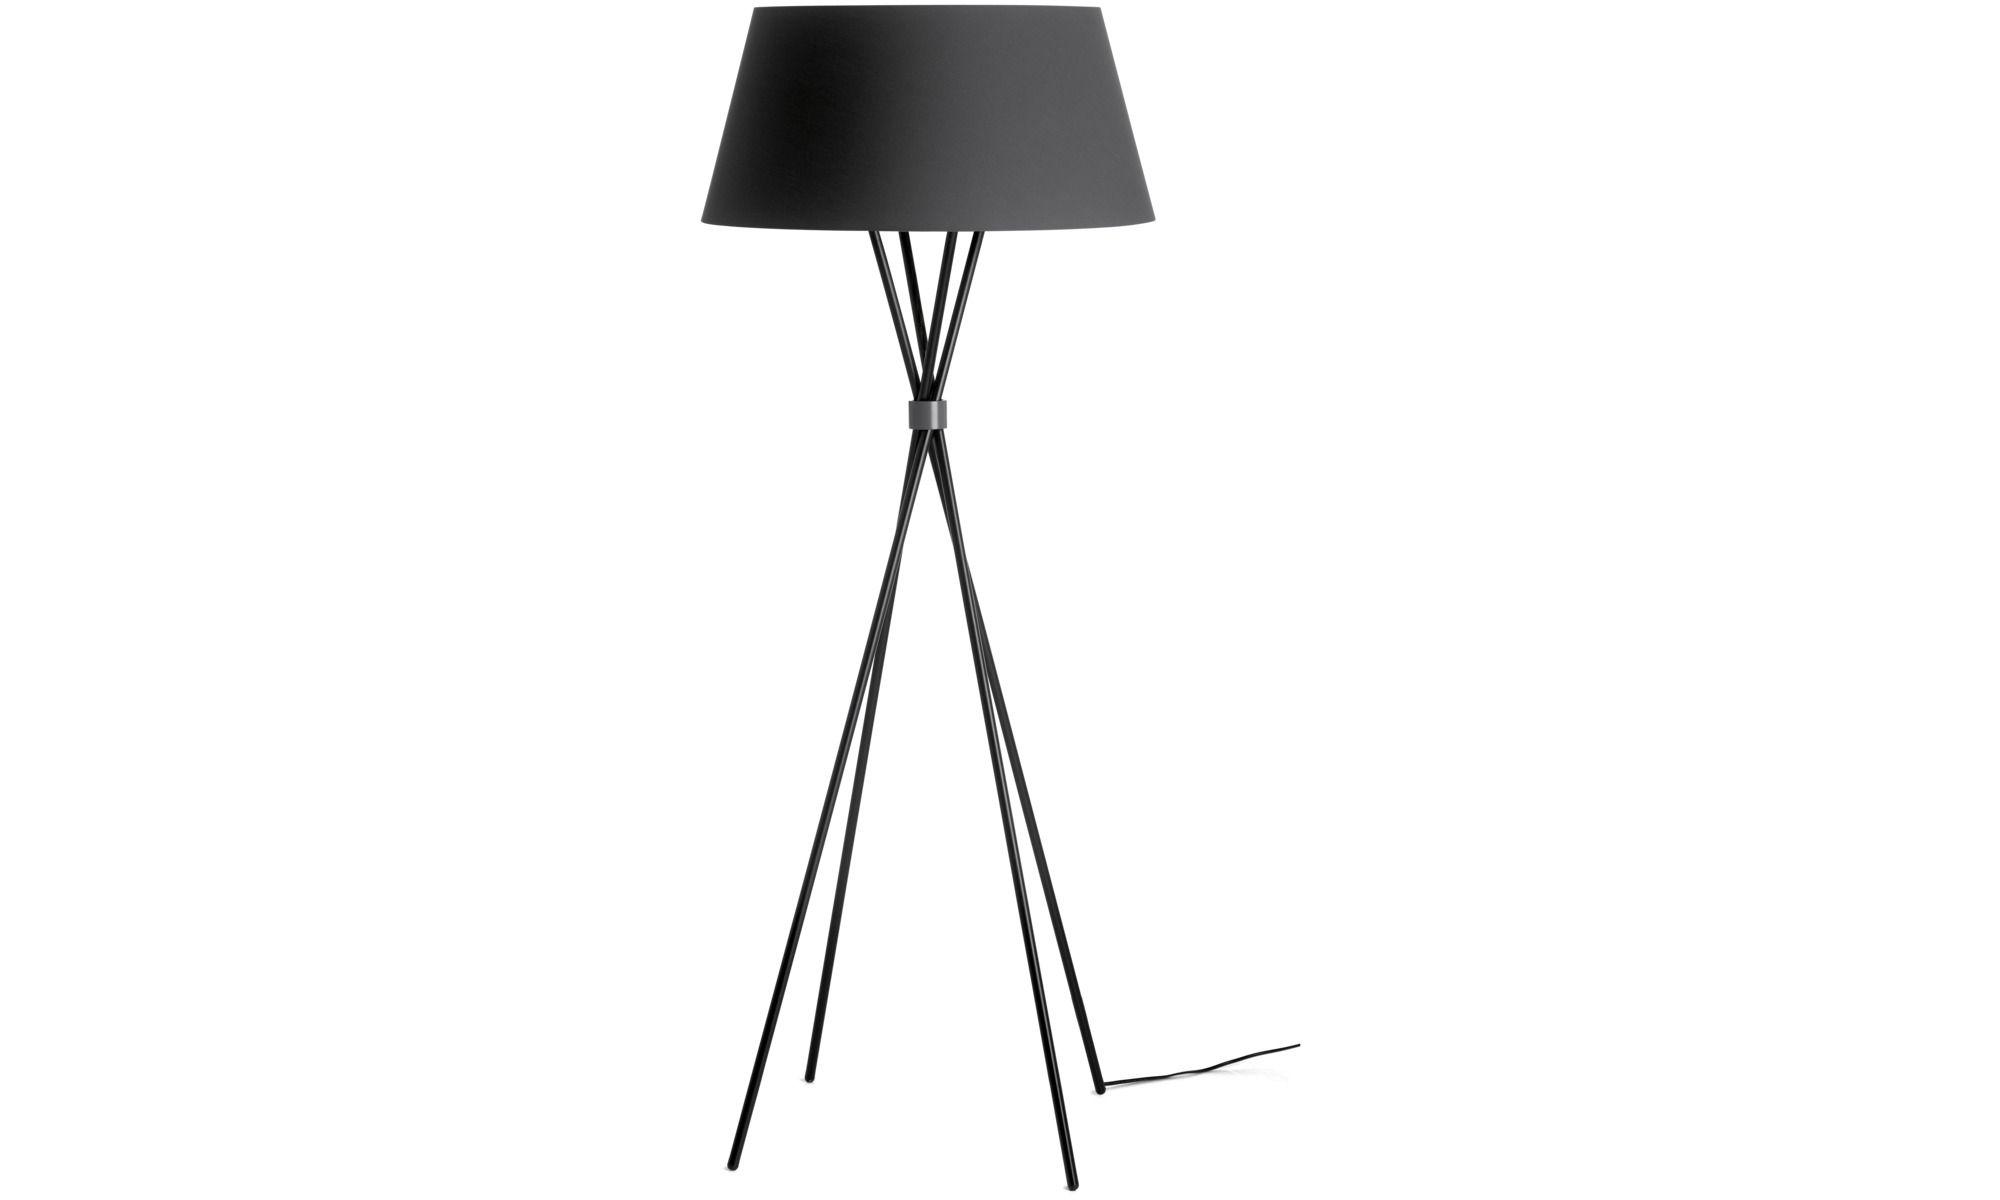 Main Floor Lamp Lamp Floor Lamp Black Floor Lamp